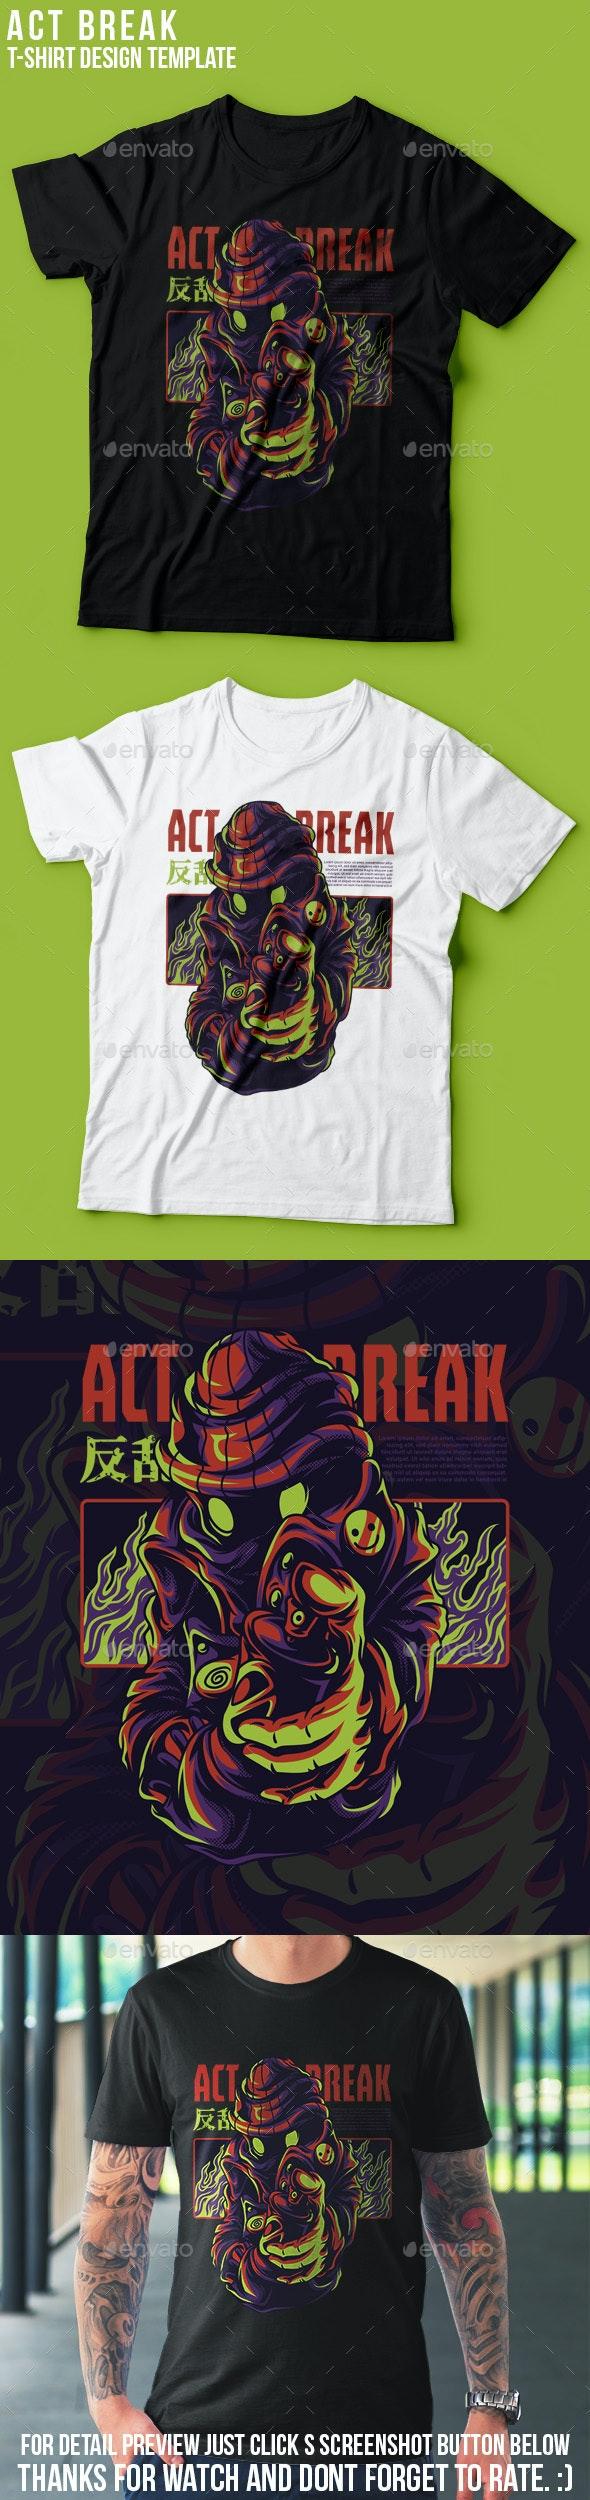 Act Break T-Shirt Design - Designs T-Shirts